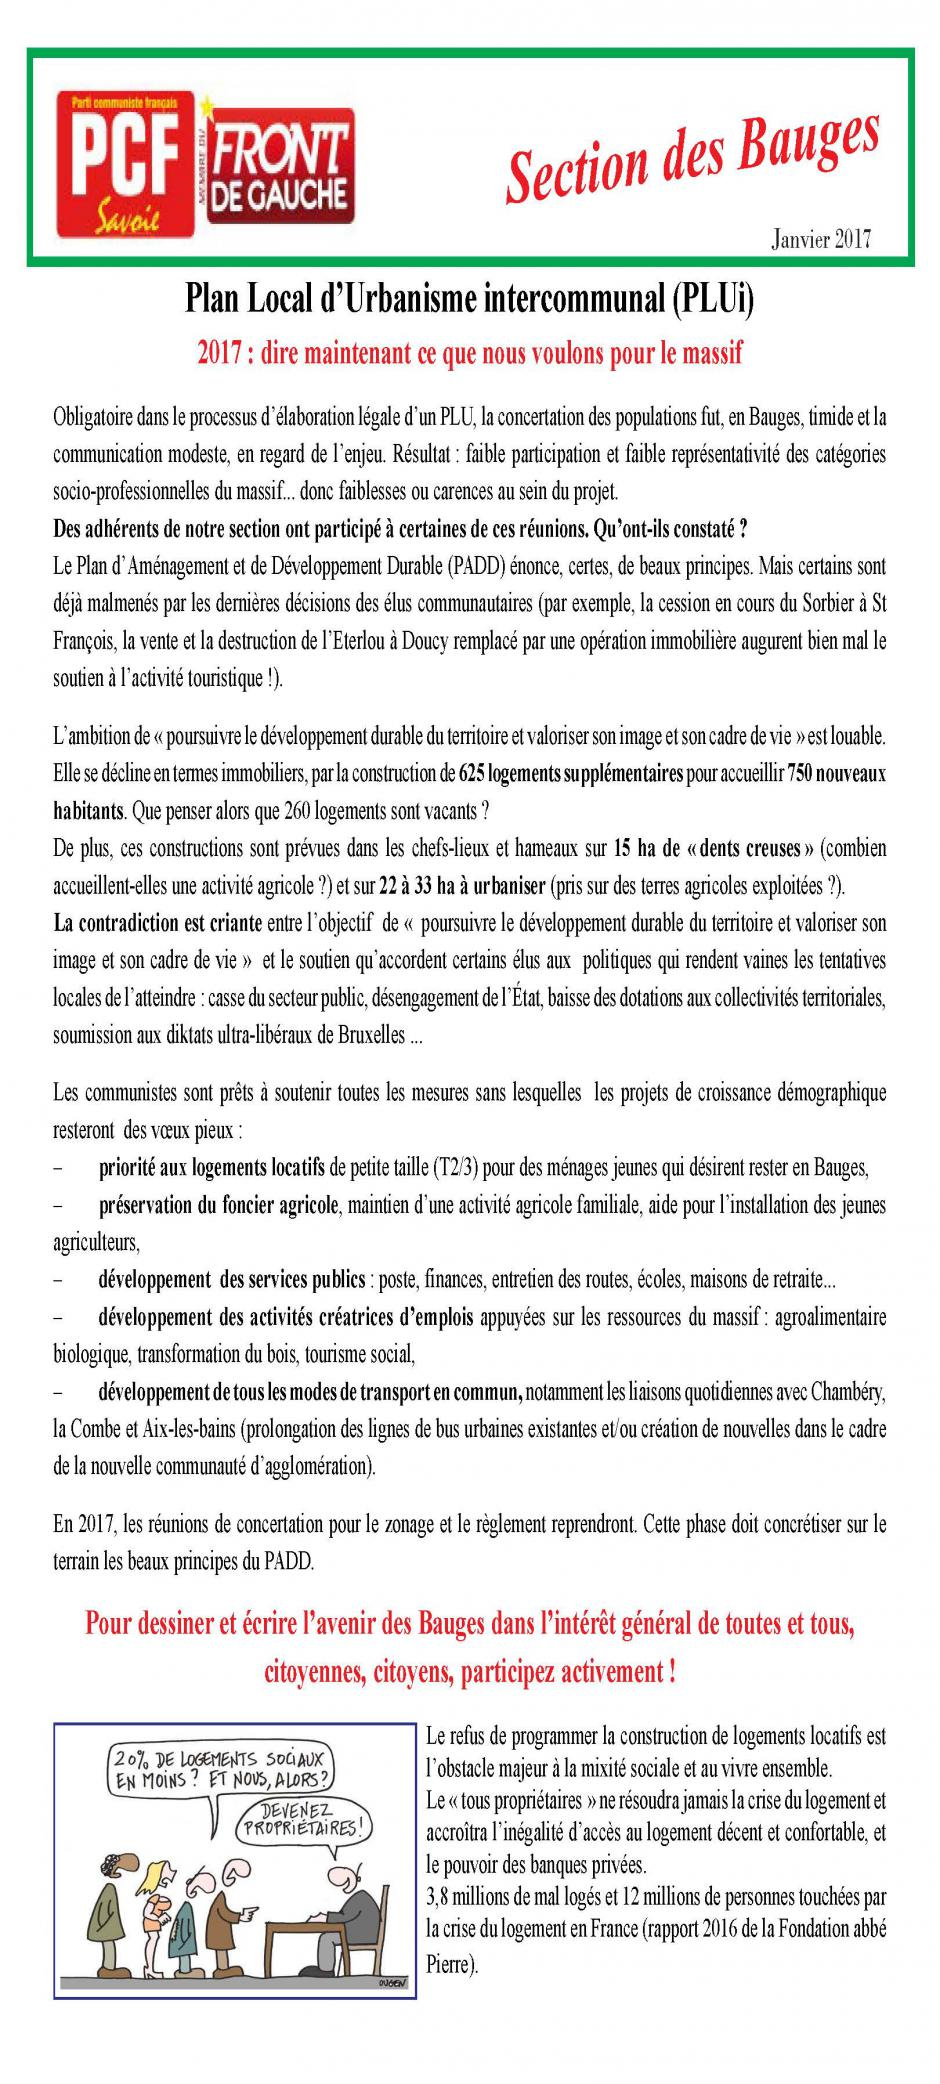 Bulletin des Bauges - Janvier 2017